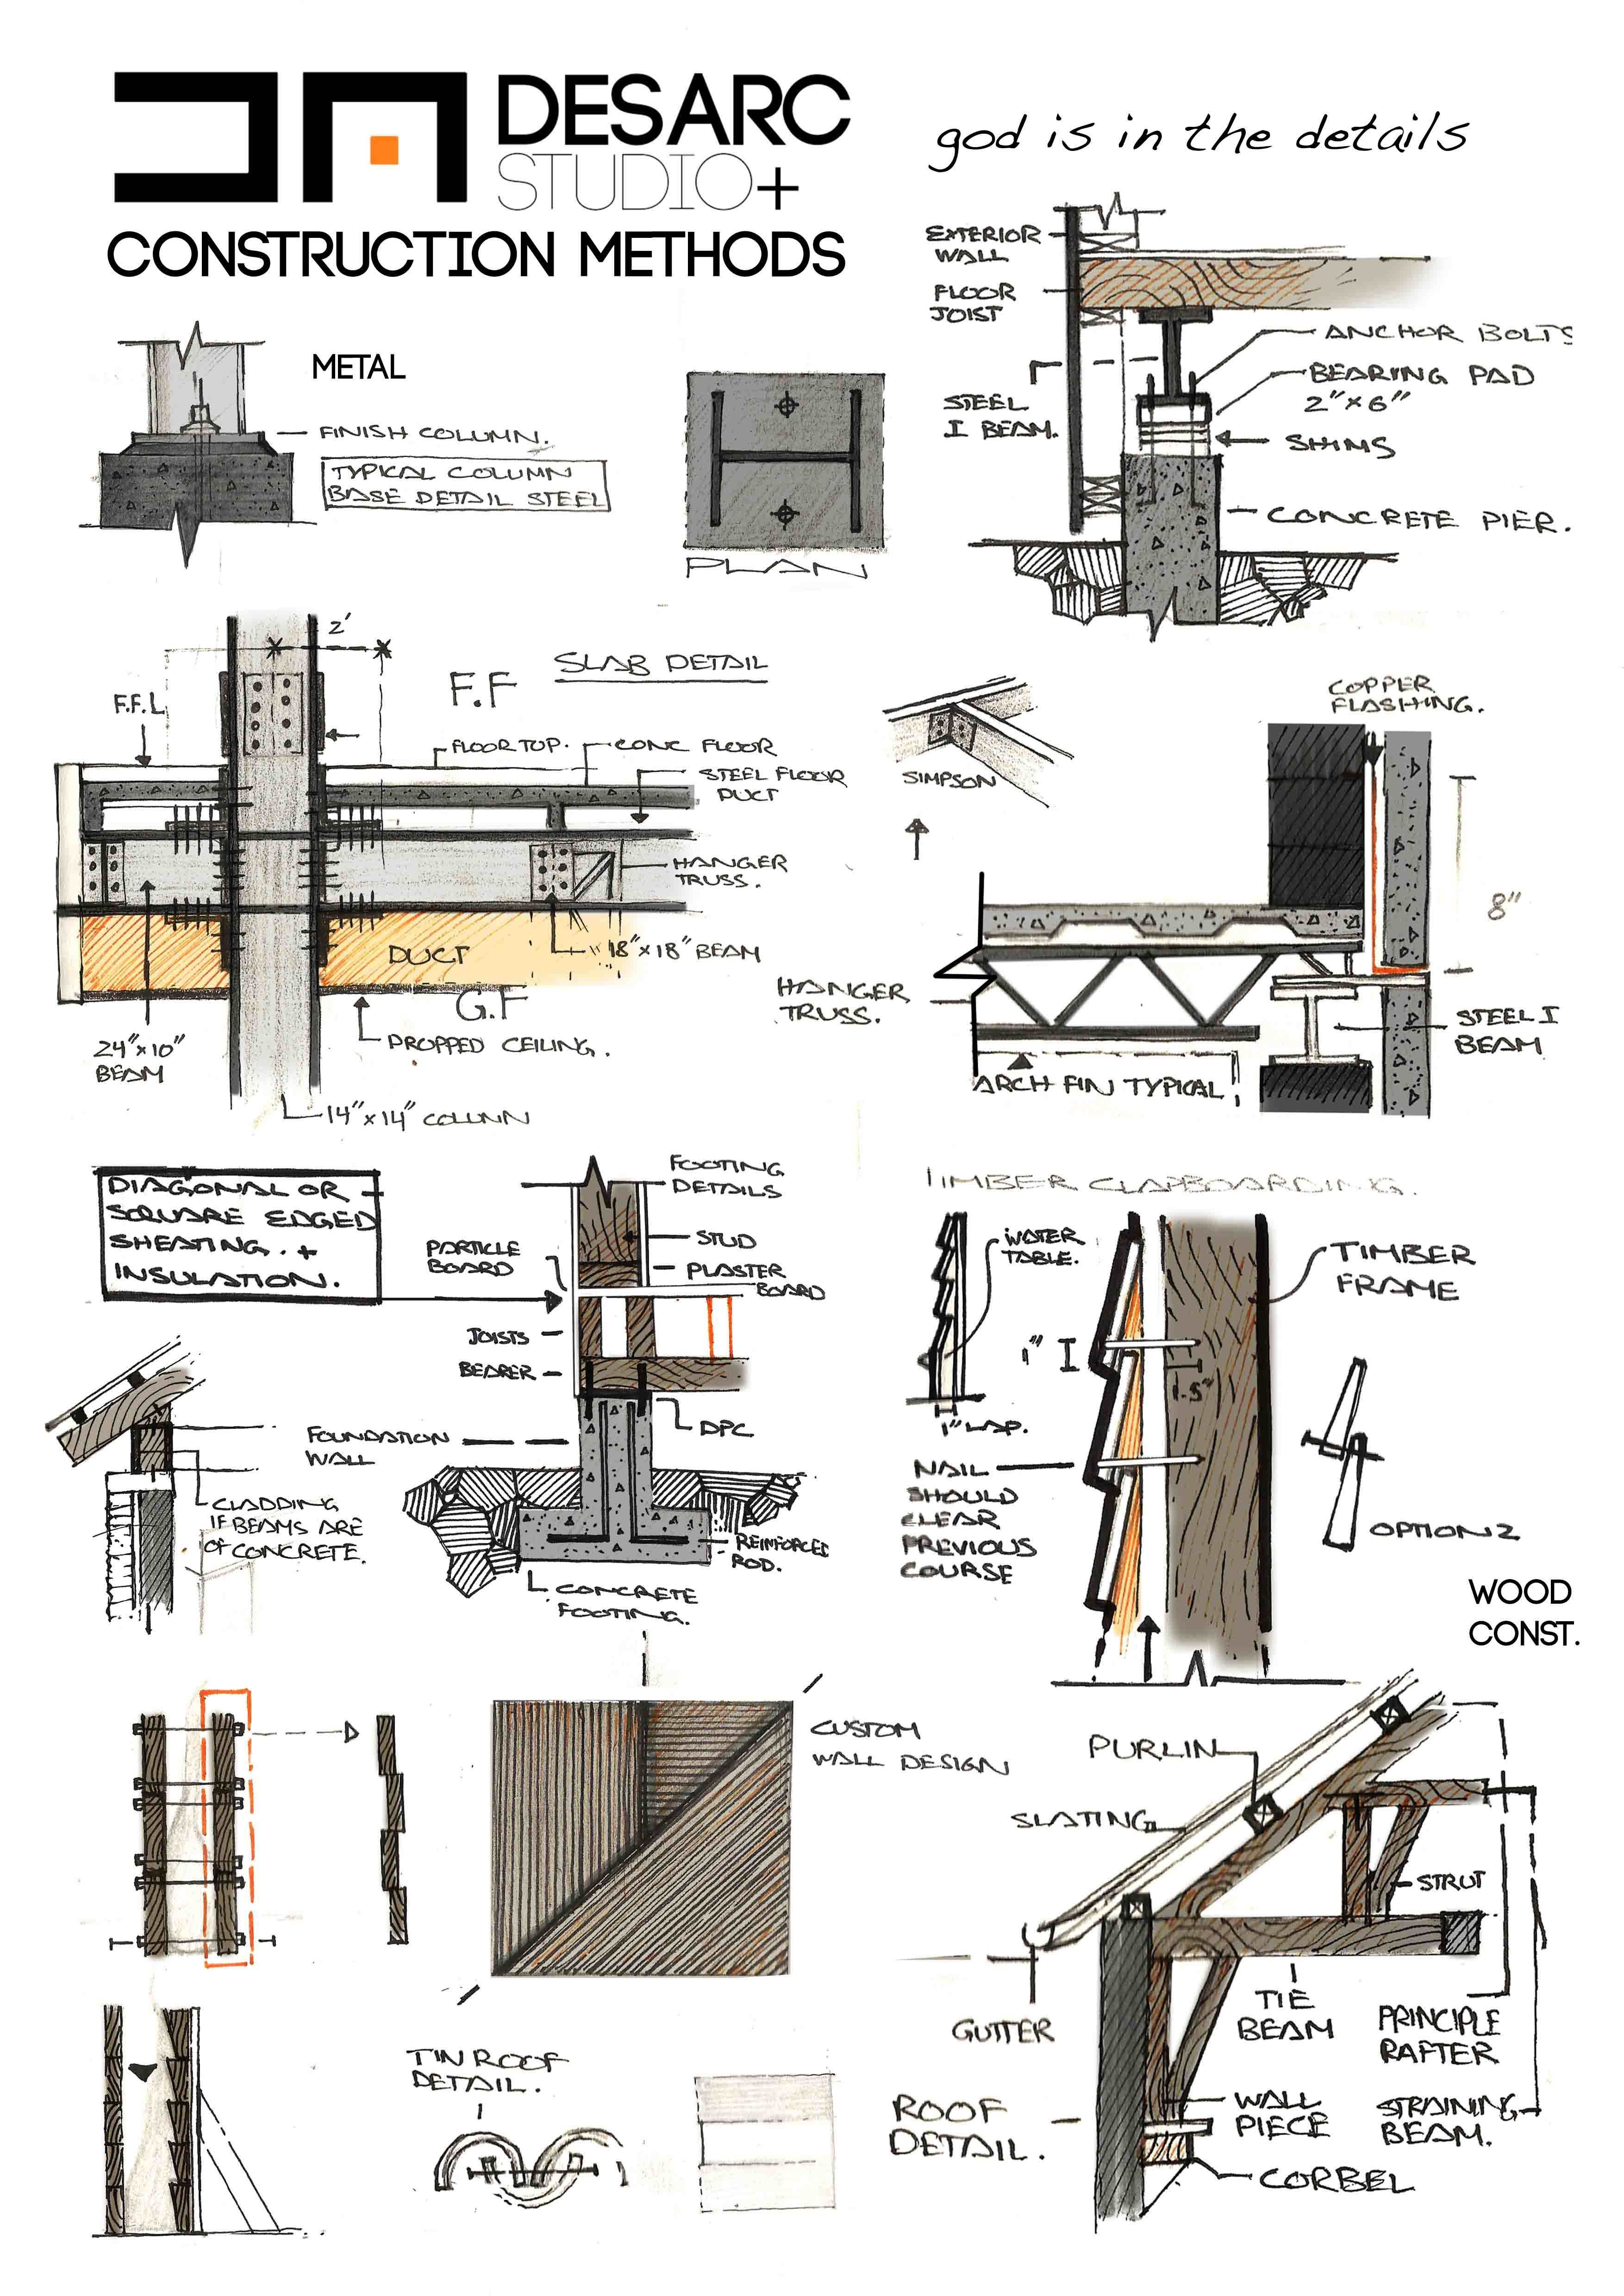 Unbelievable Tricks Tiny Attic Rustic Attic Window Apartment Therapy Attic Skylight Built Ins Attic Library R Architecture Plan Architecture Details Architect